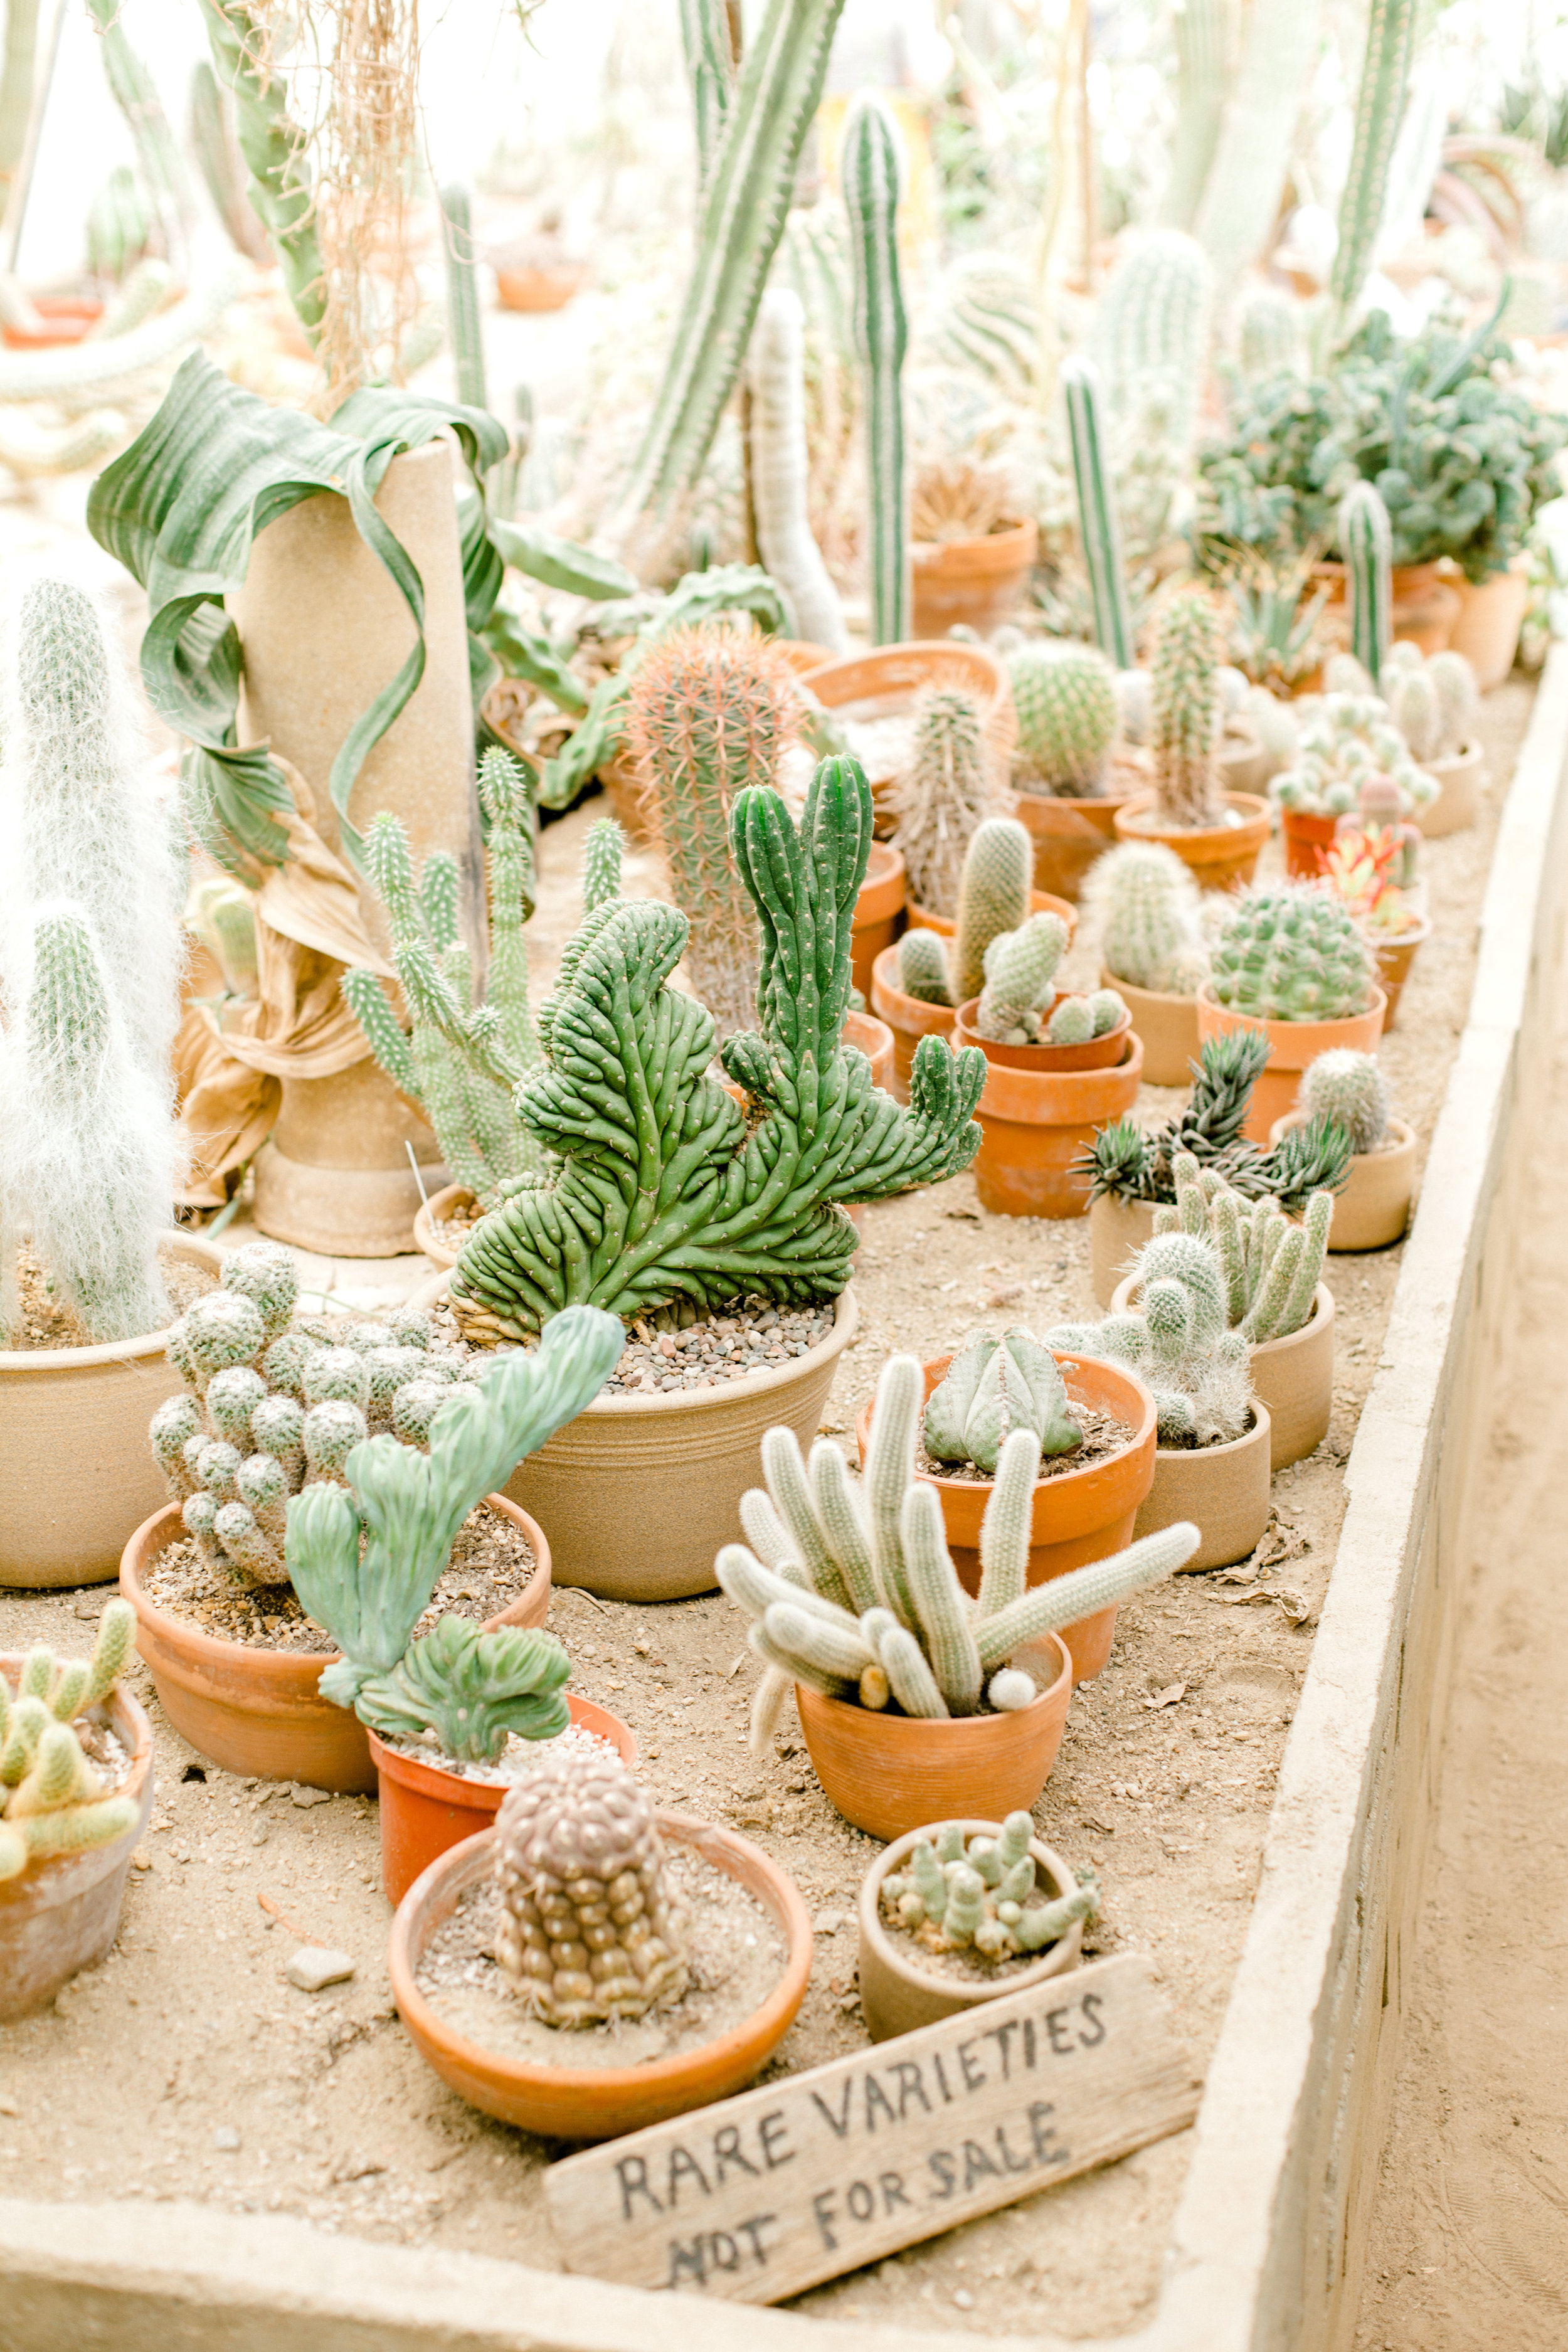 Jessica Sgubin Photography Atlanta Portrait photographer los angeles la salvation mountain greenhouse cactus garden moorten botanical garden cabazon dinosaurs santa monica joshua tree-44.jpg